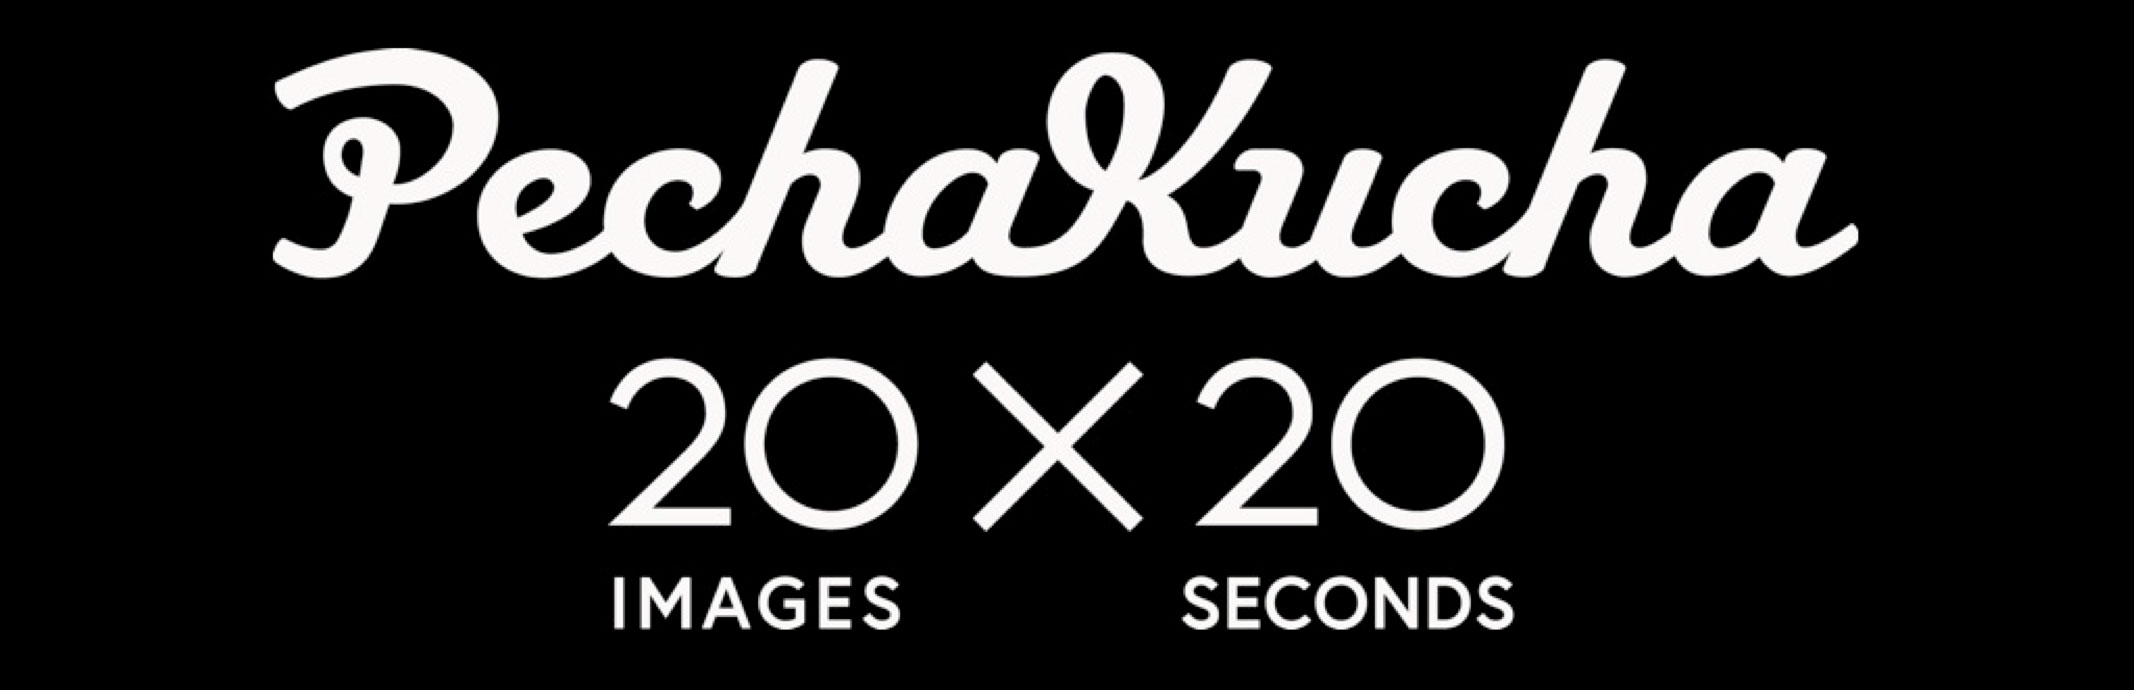 logo for pechakucha